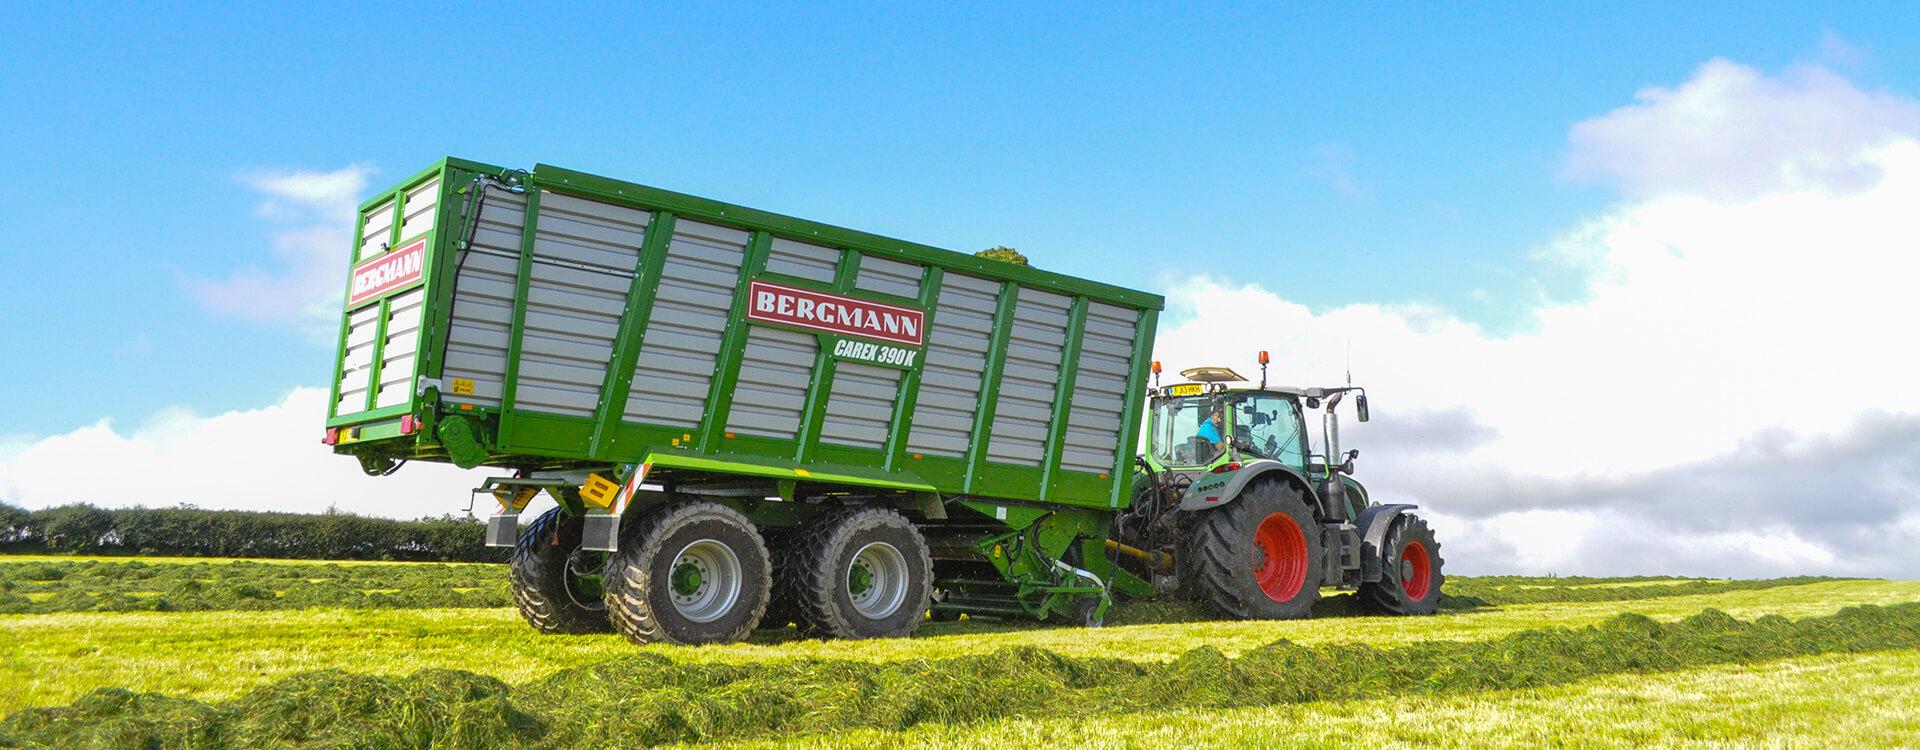 forage wagon Bergmann carex 390k